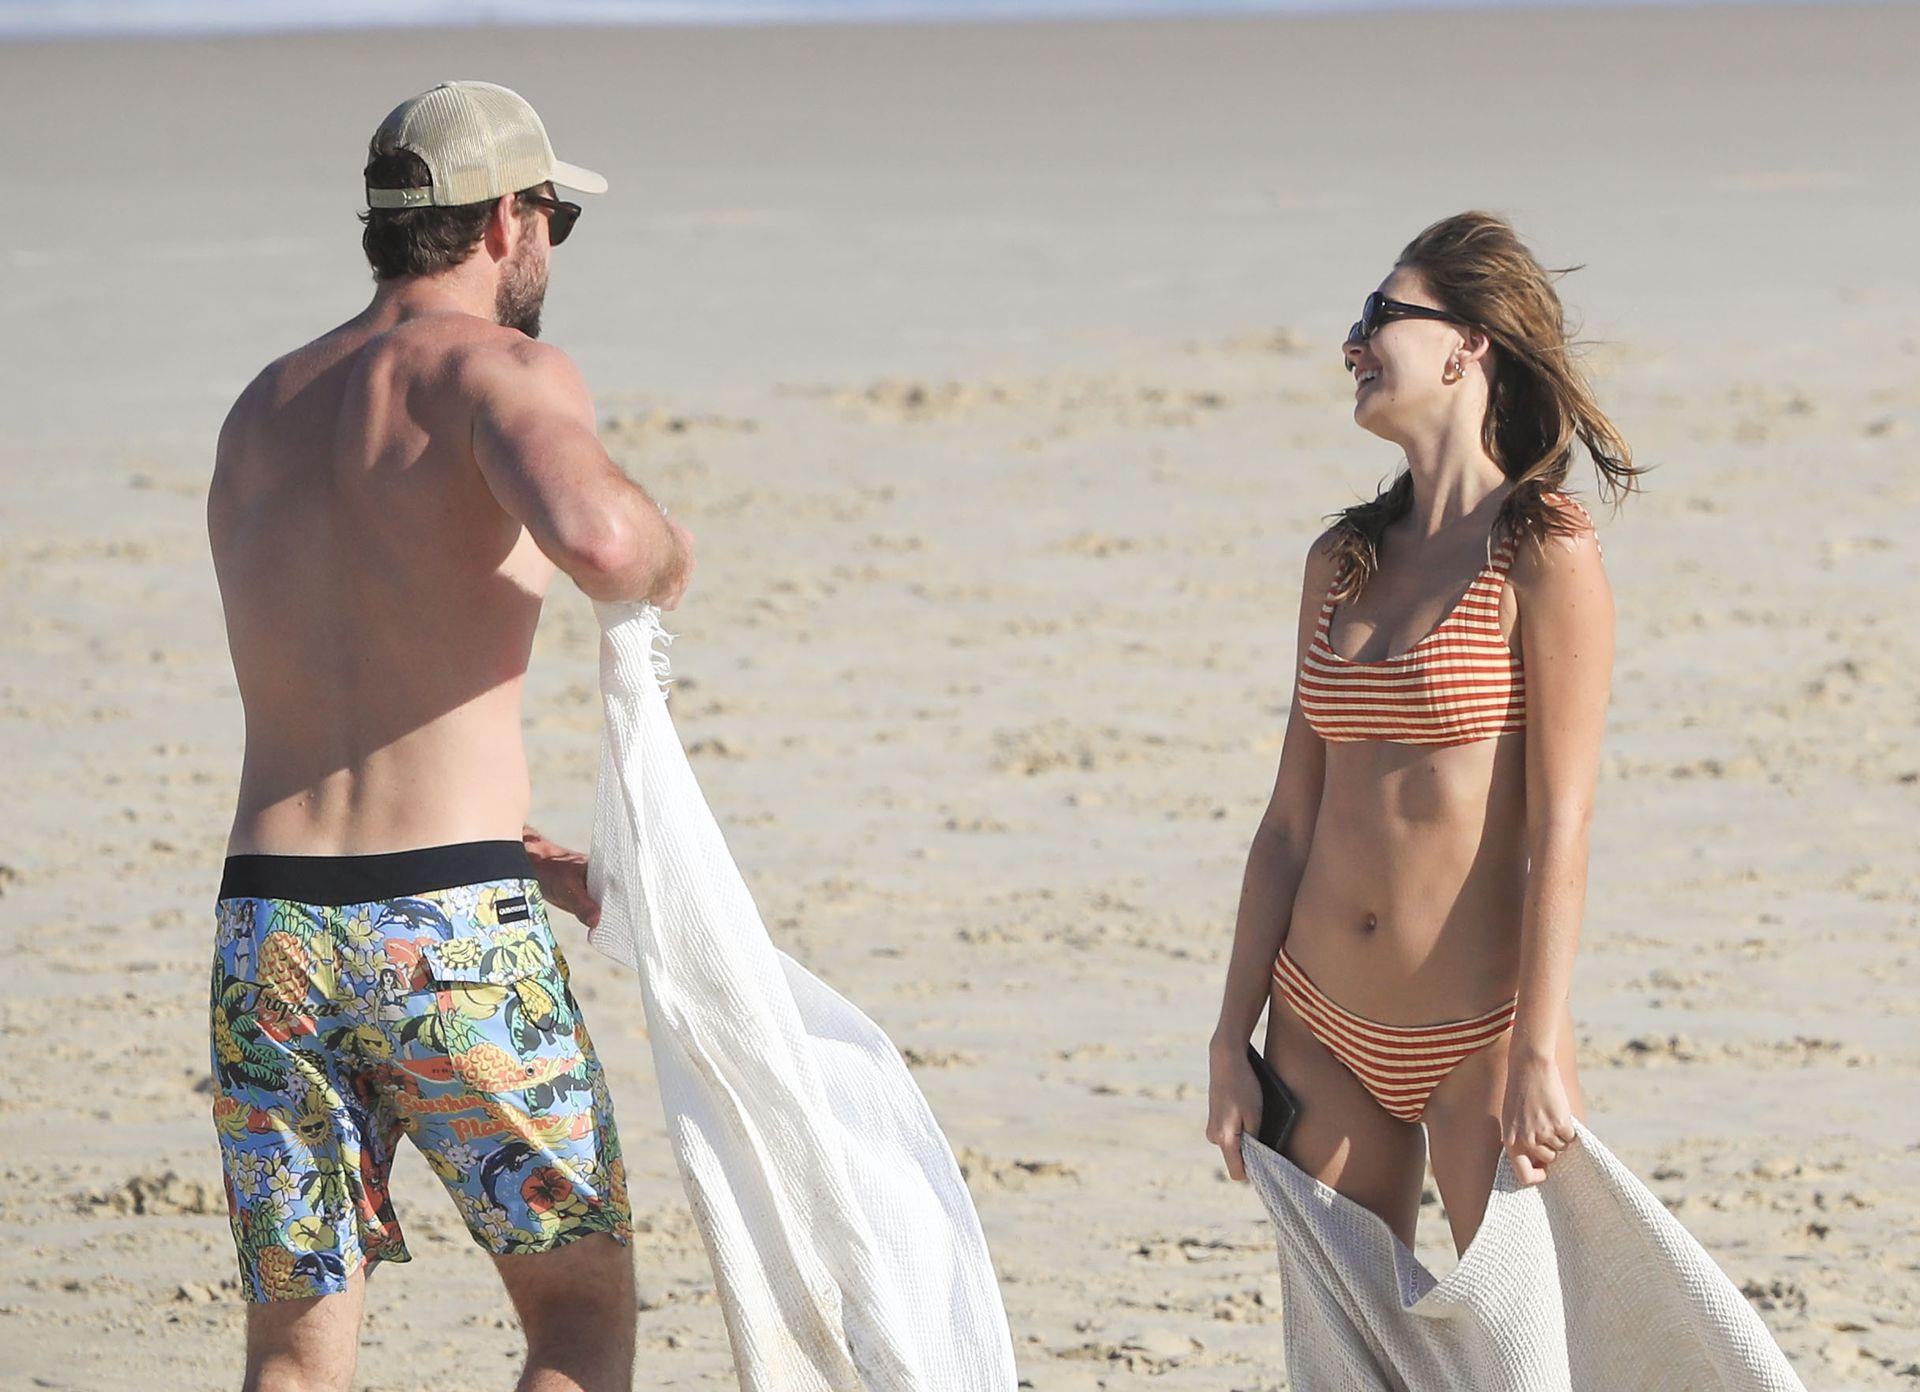 Gabriella Brooks Hot – Liam Hemsworth's New Girlfriend 0054